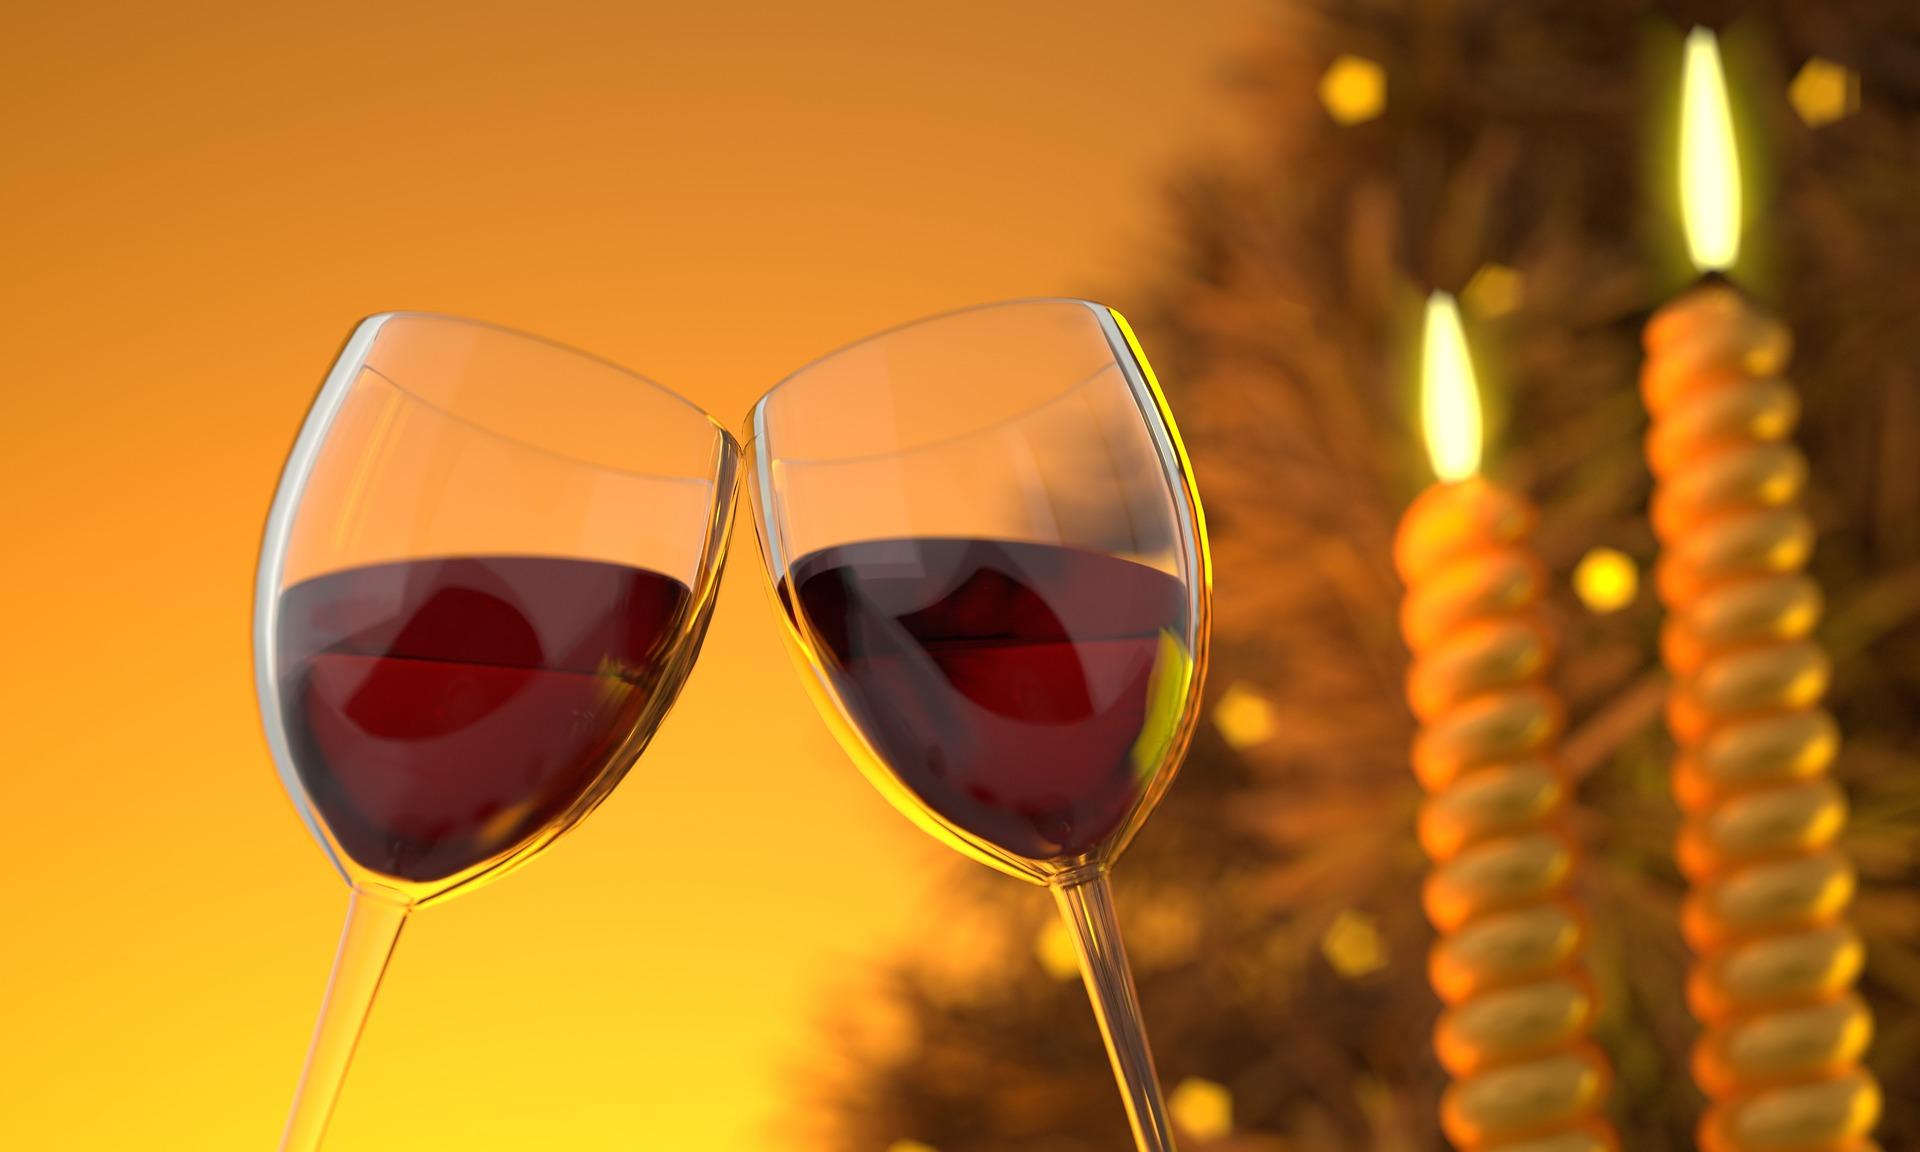 wine-2891894_1920.jpg